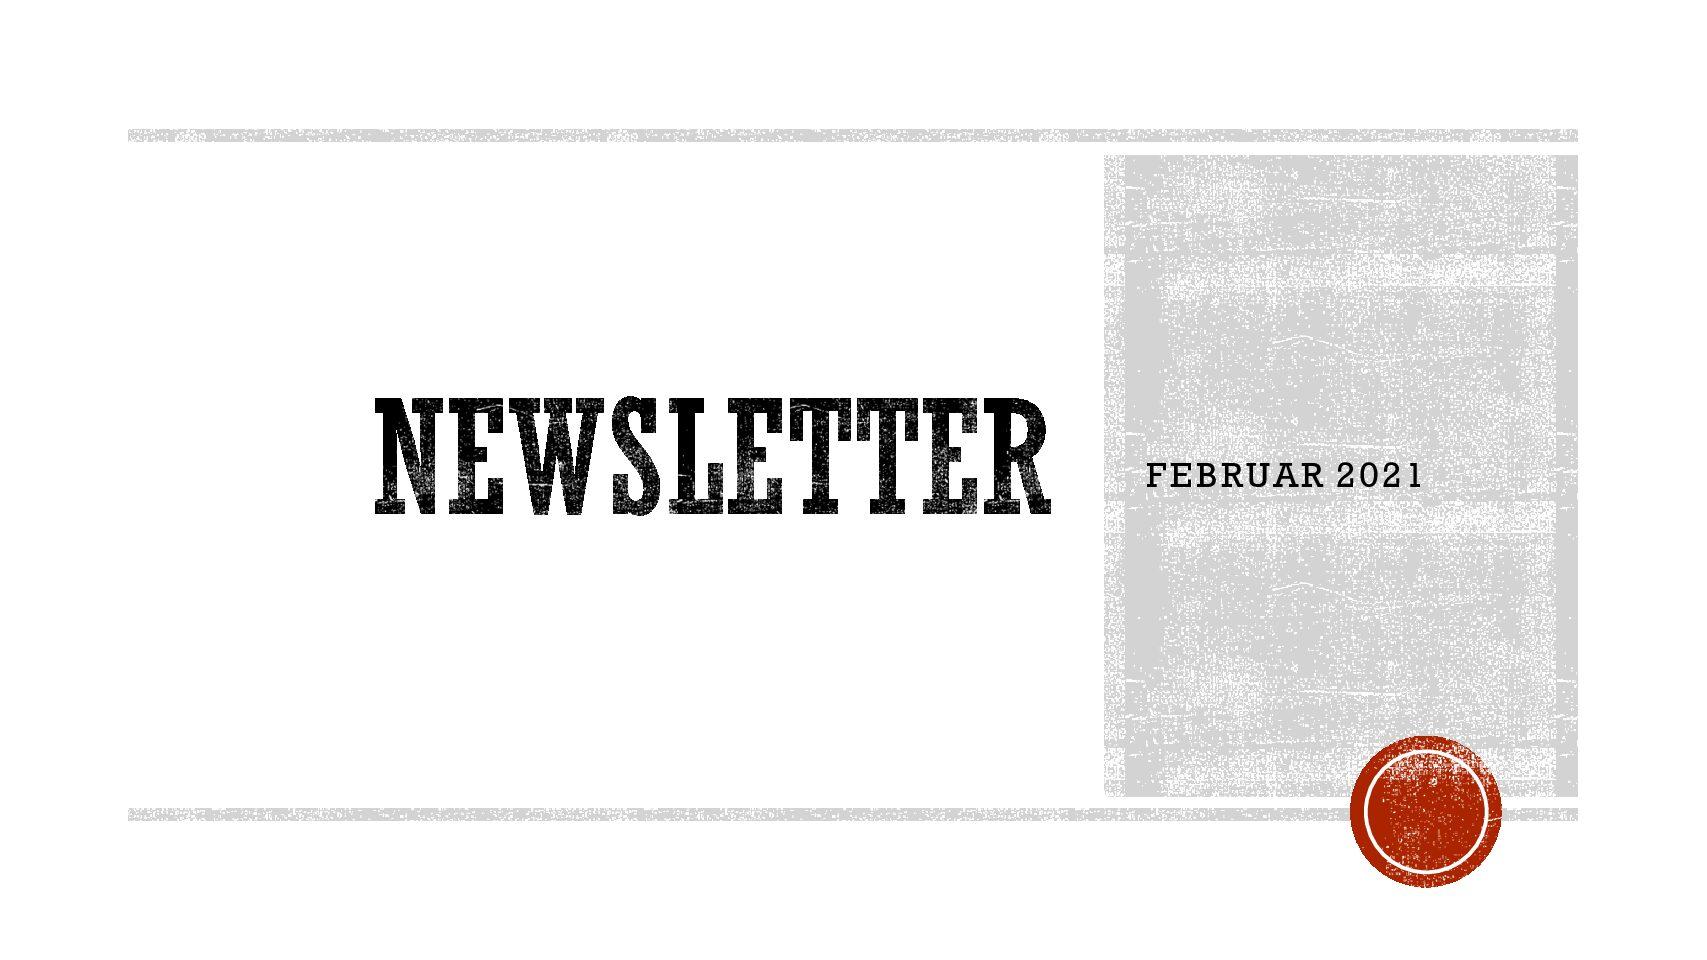 https://www.iik-goettingen.de/wp-content/uploads/2021/03/2021_Newsletter_Sprachentandem-pdf.jpg